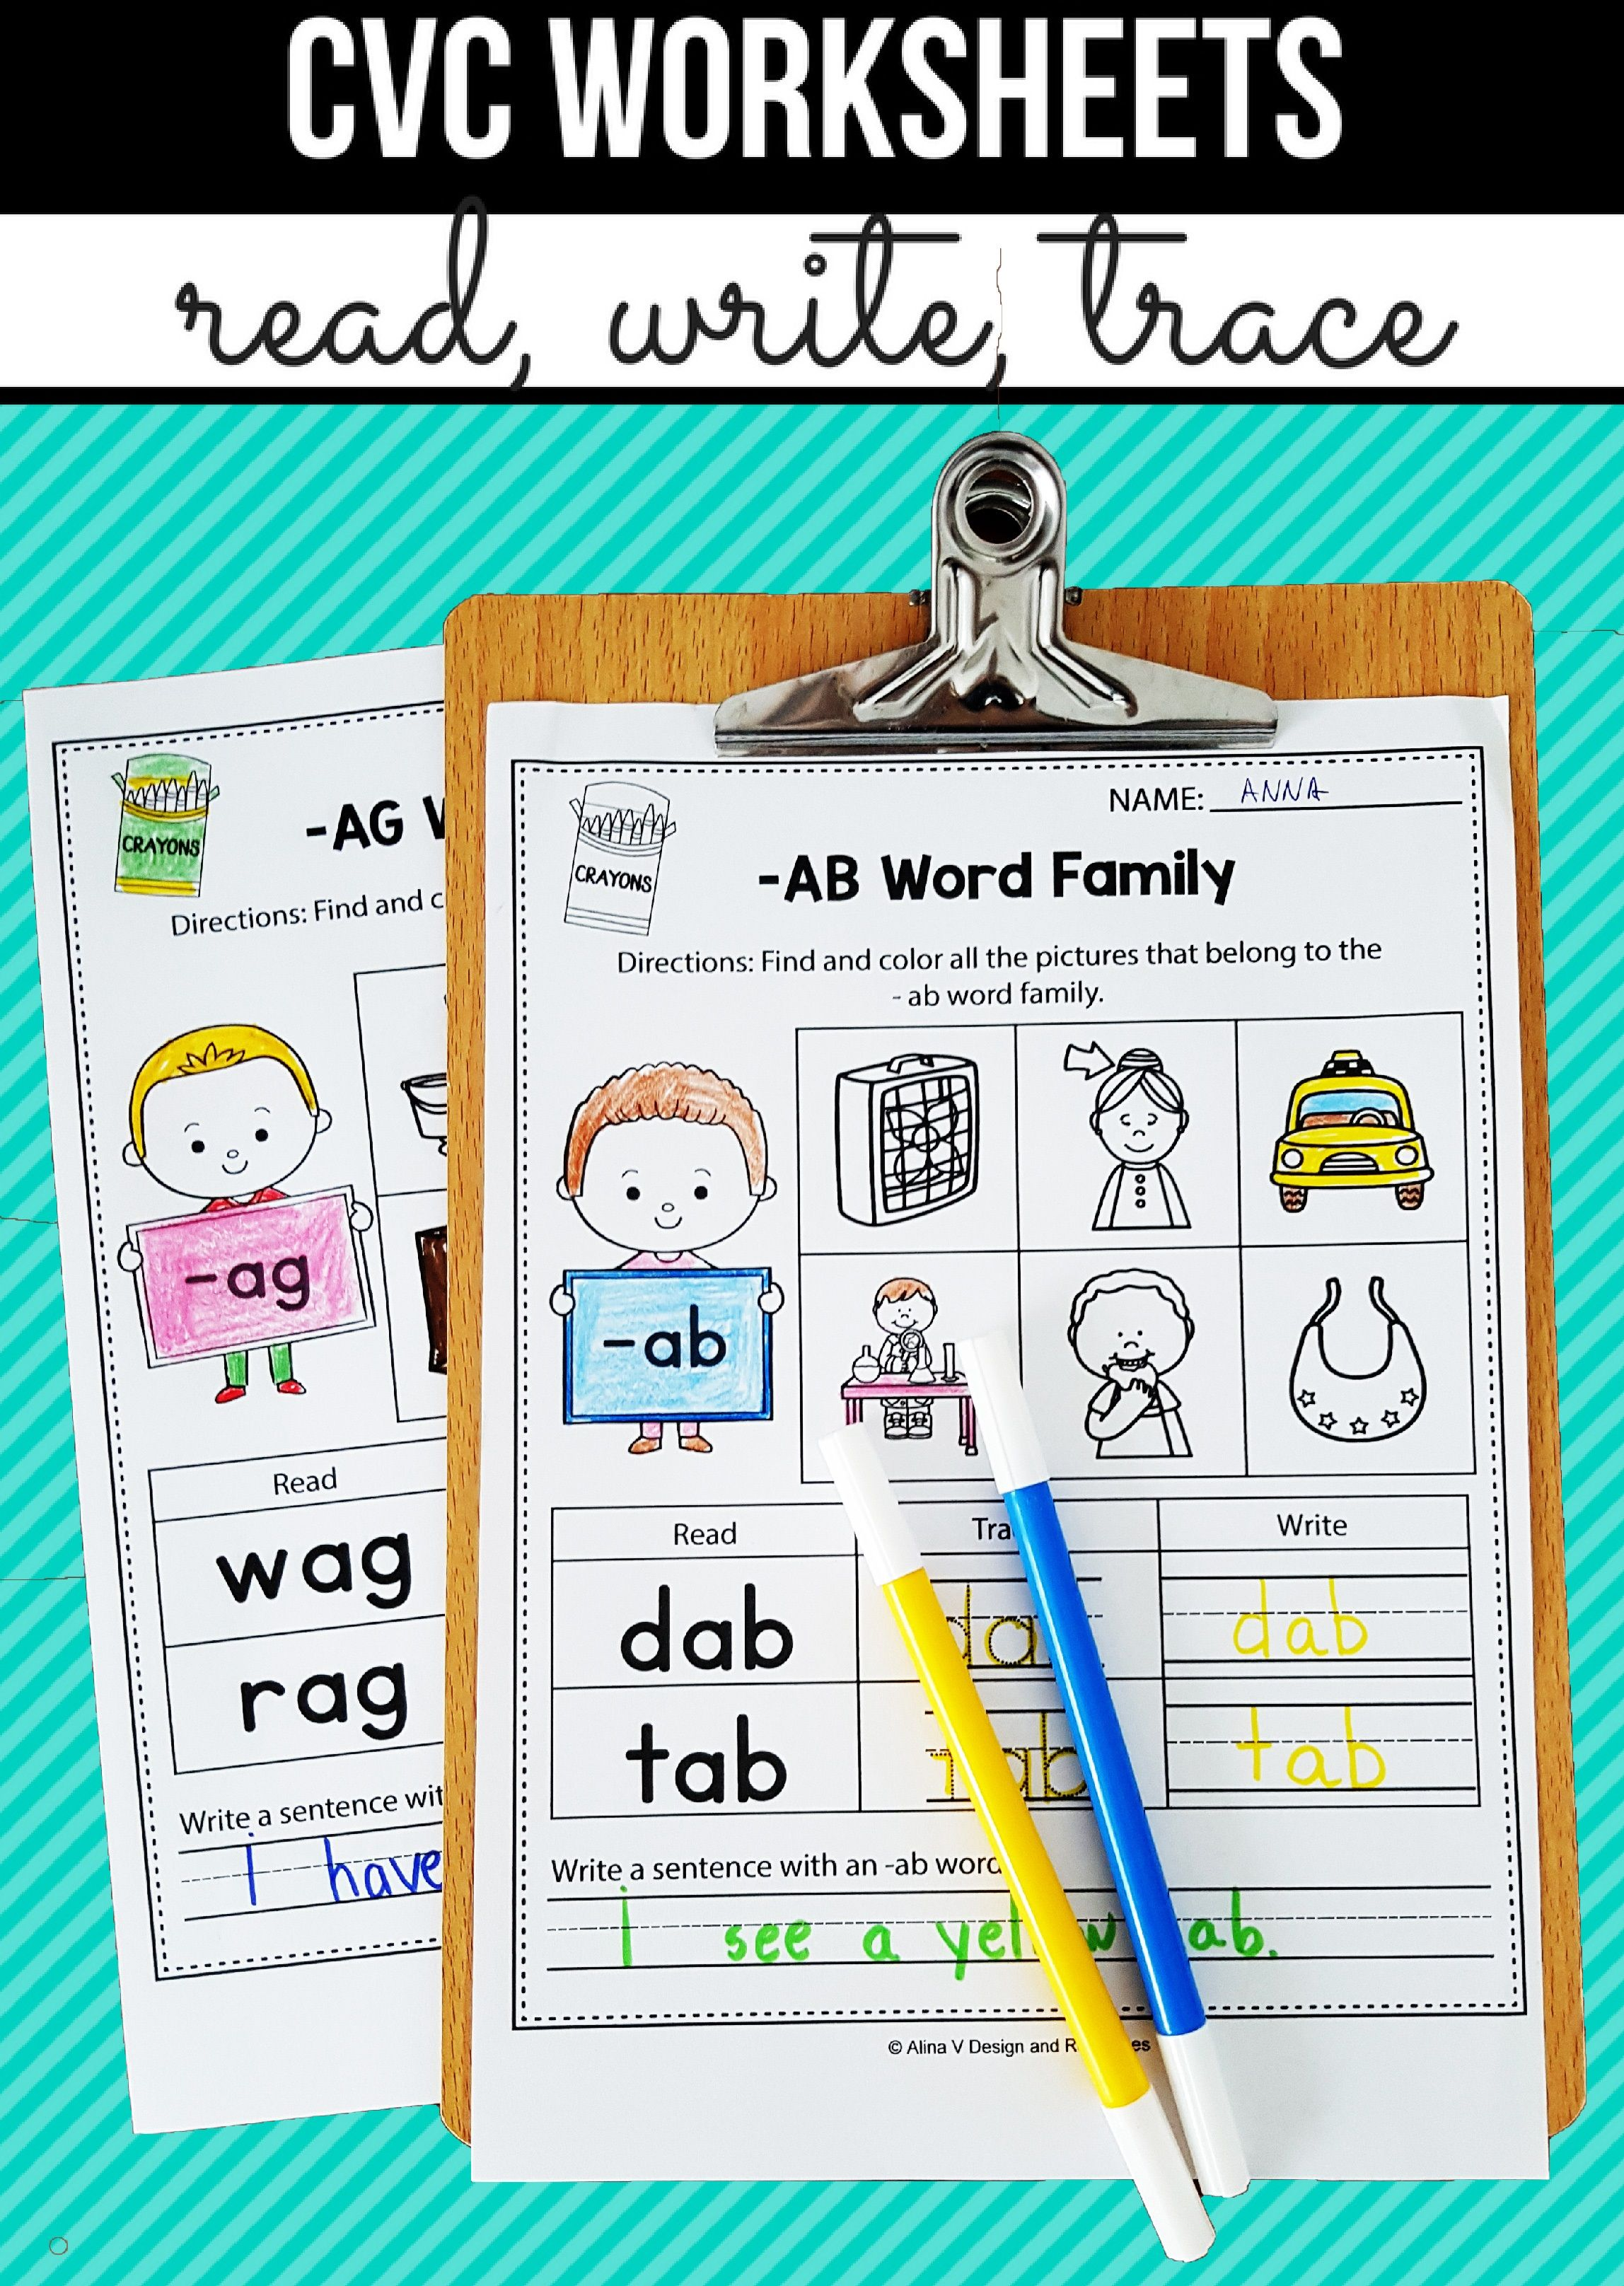 small resolution of CVC Words Worksheets All Vowels CVC Word Families Worksheets Kindergarten    Cvc words